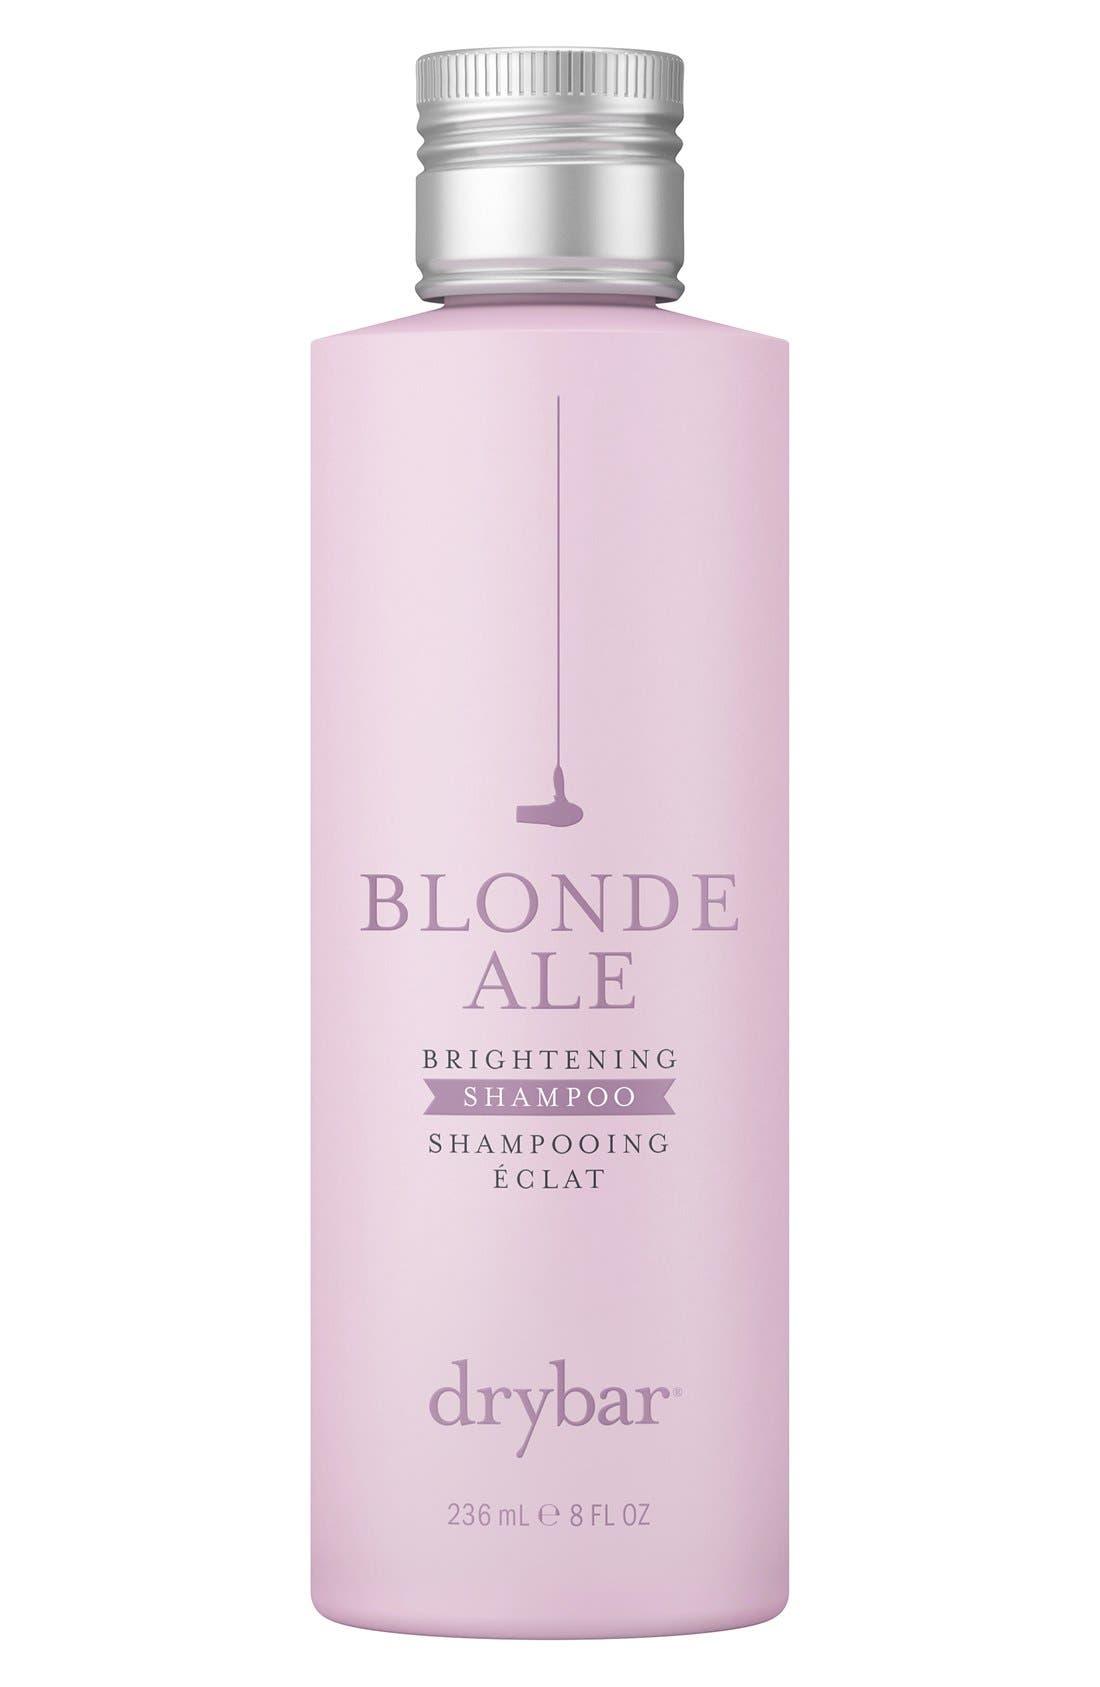 Drybar 'Blonde Ale' Brightening Shampoo